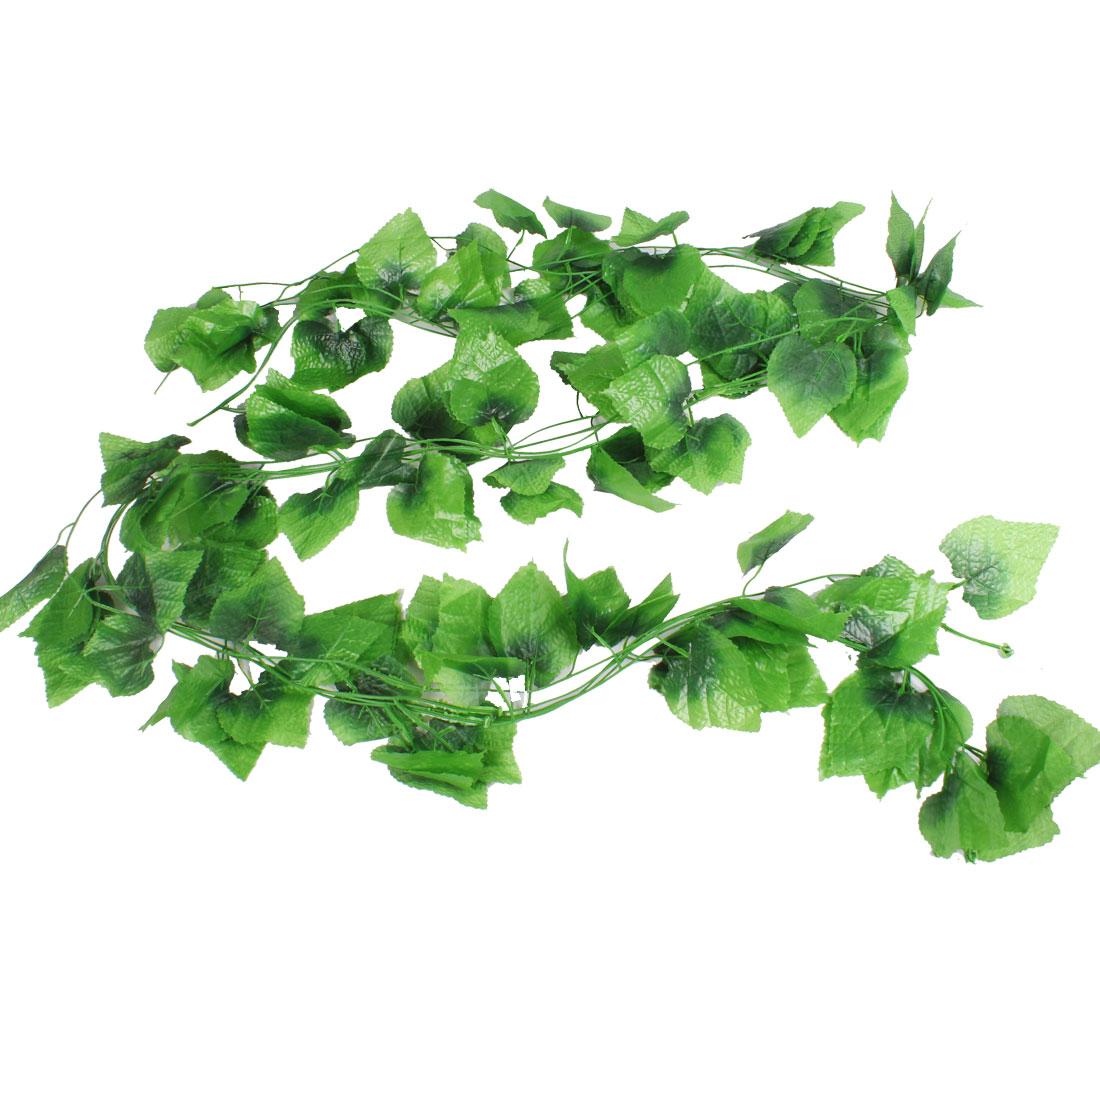 Home Wedding Party Decor Green Plastic Simulated Leaf Plant Vine 7.9Ft 5 Pcs